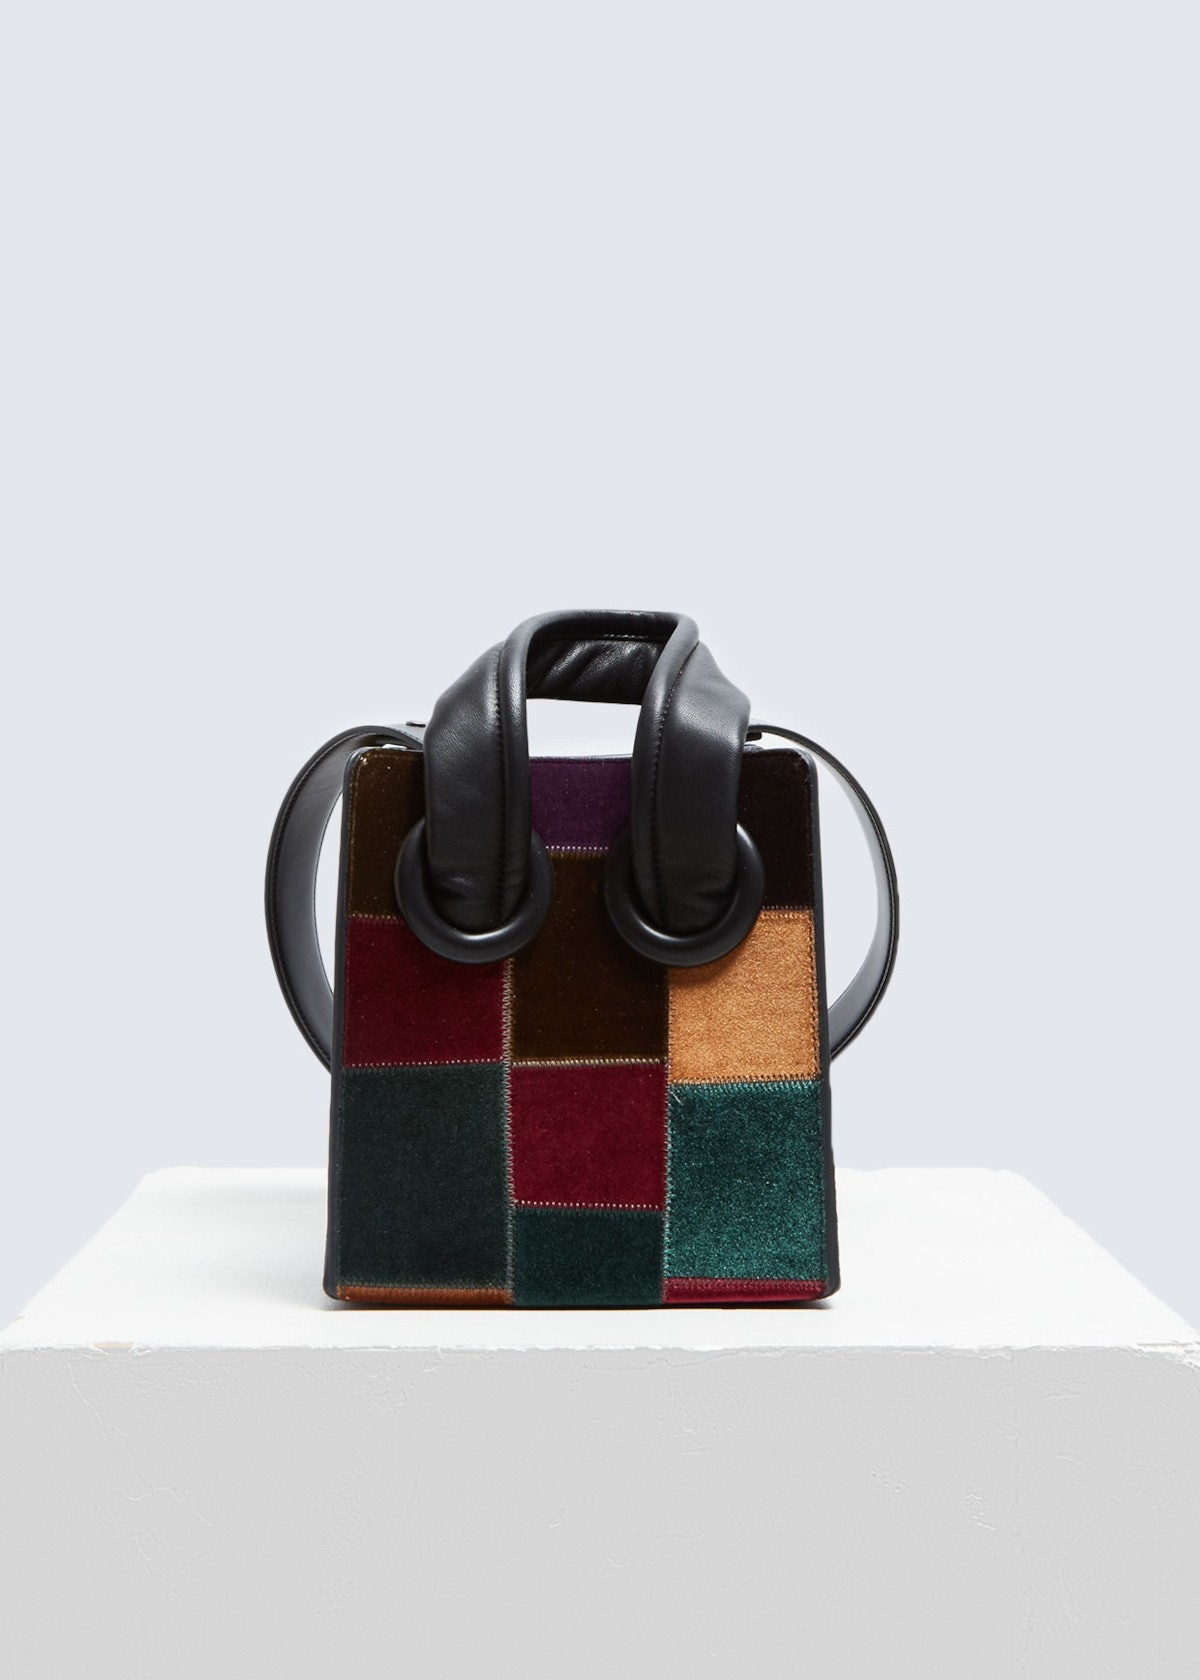 Boyy Deon 19 Handbag